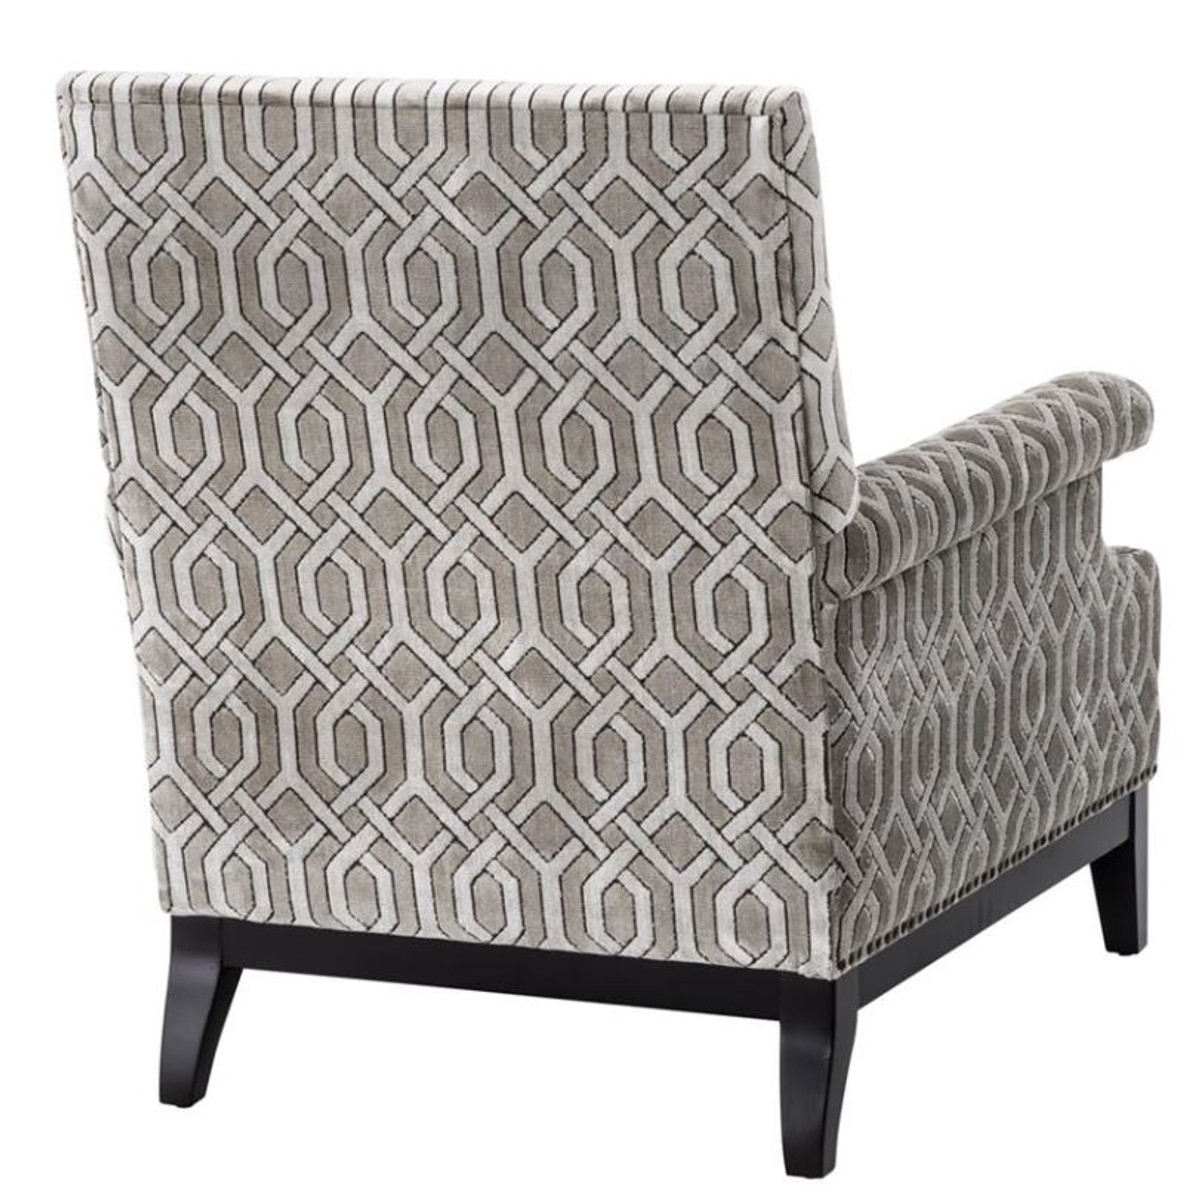 Casa padrino sessel 75 x 85 x h 93 cm luxus wohnzimmer for Luxus designer sessel